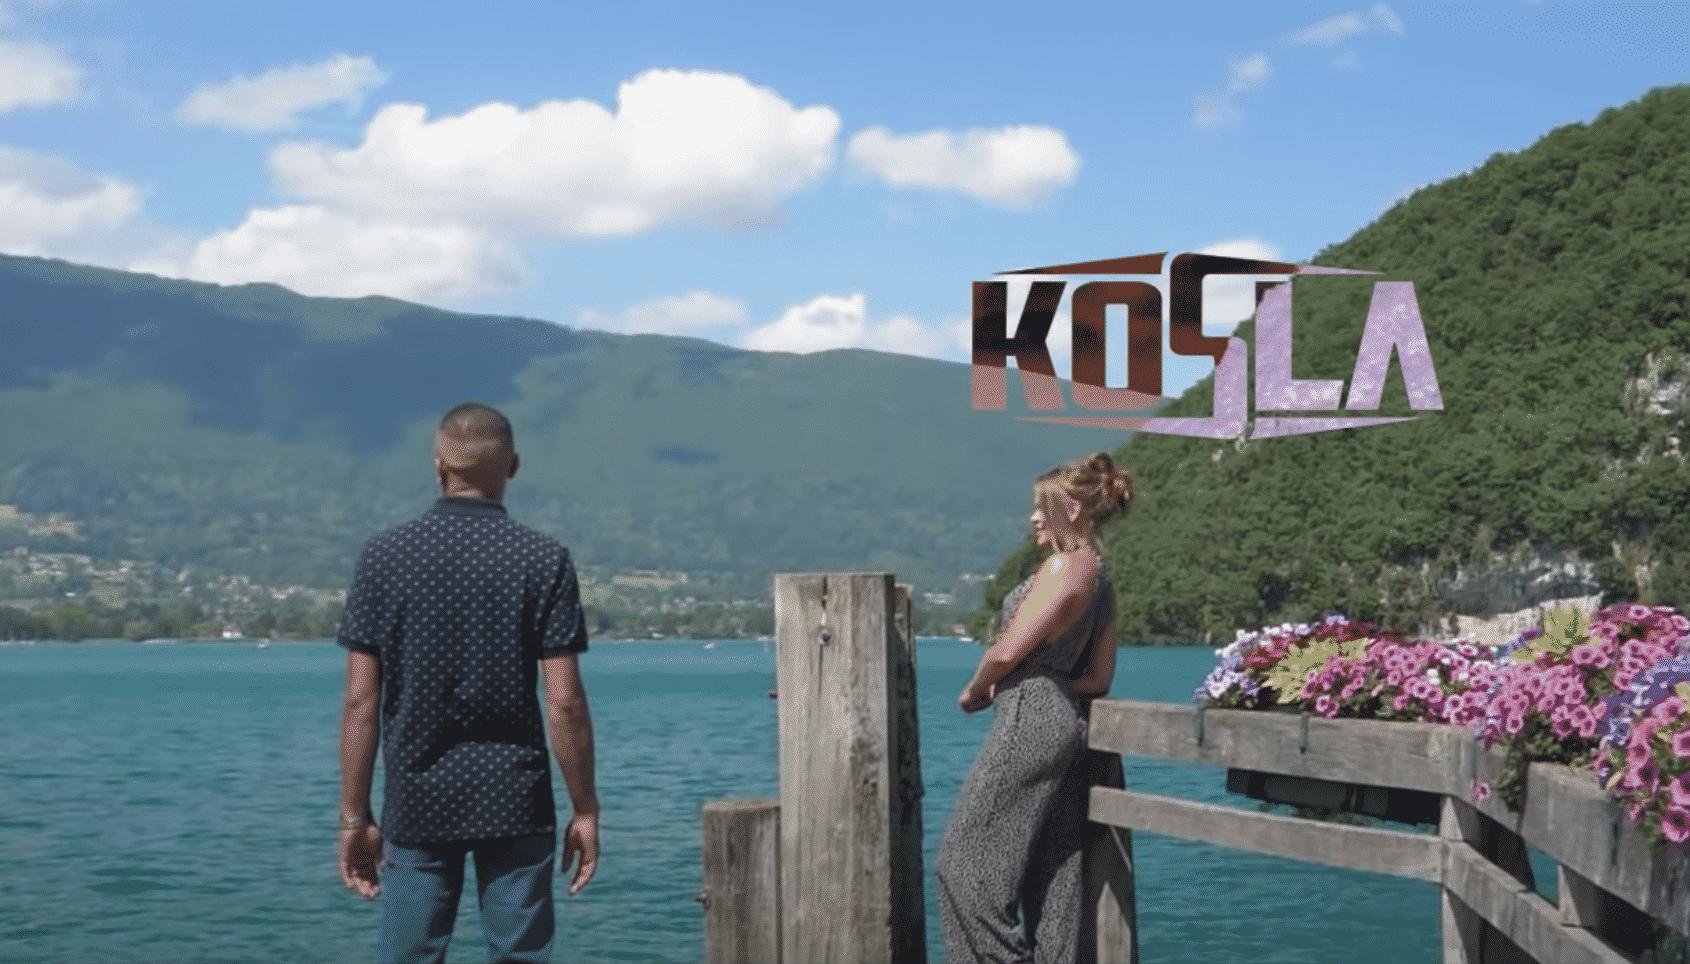 Kosla nous offre sa 'Confiance'